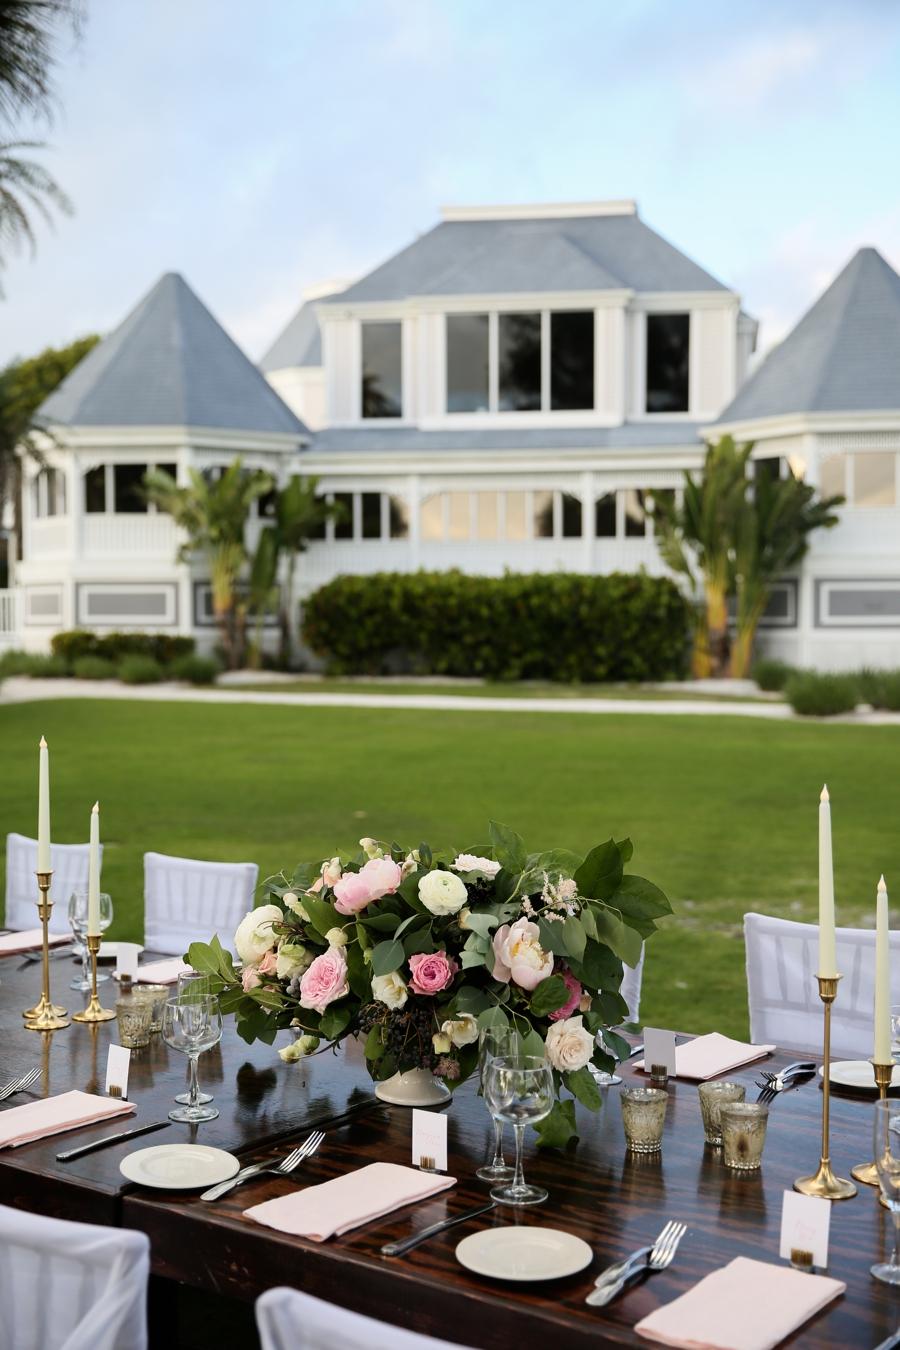 Casa_Ybel_Wedding_ Sanibel_Wedding_Florist_Designer_Planner_1862.jpg